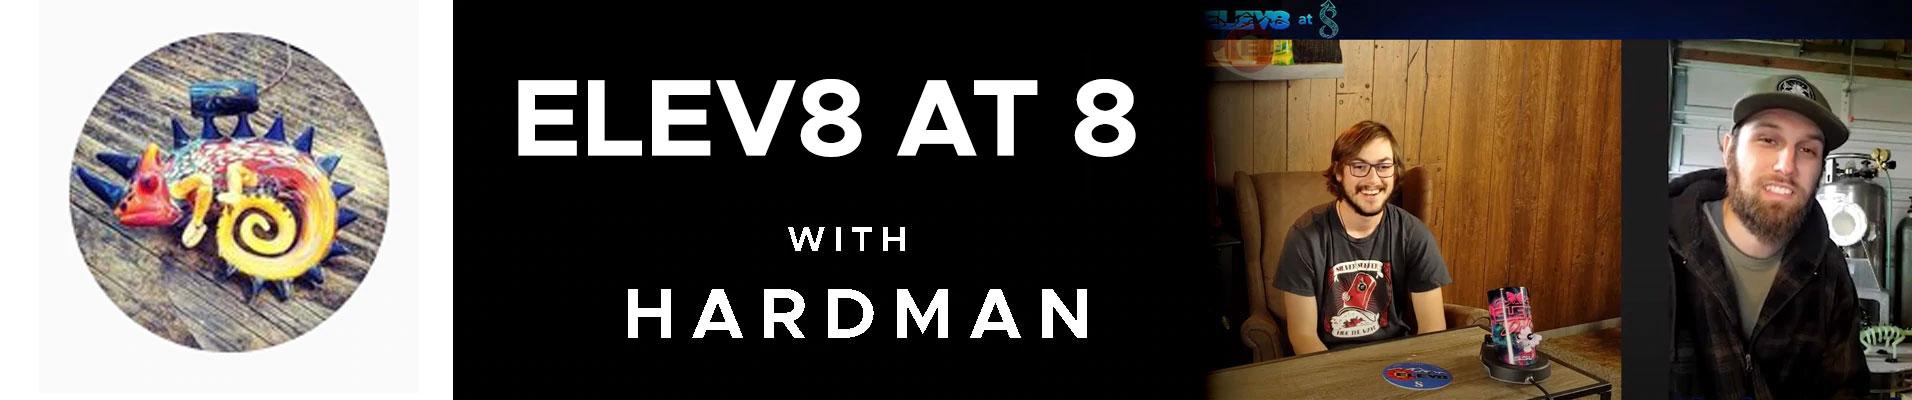 11-hardman.jpg